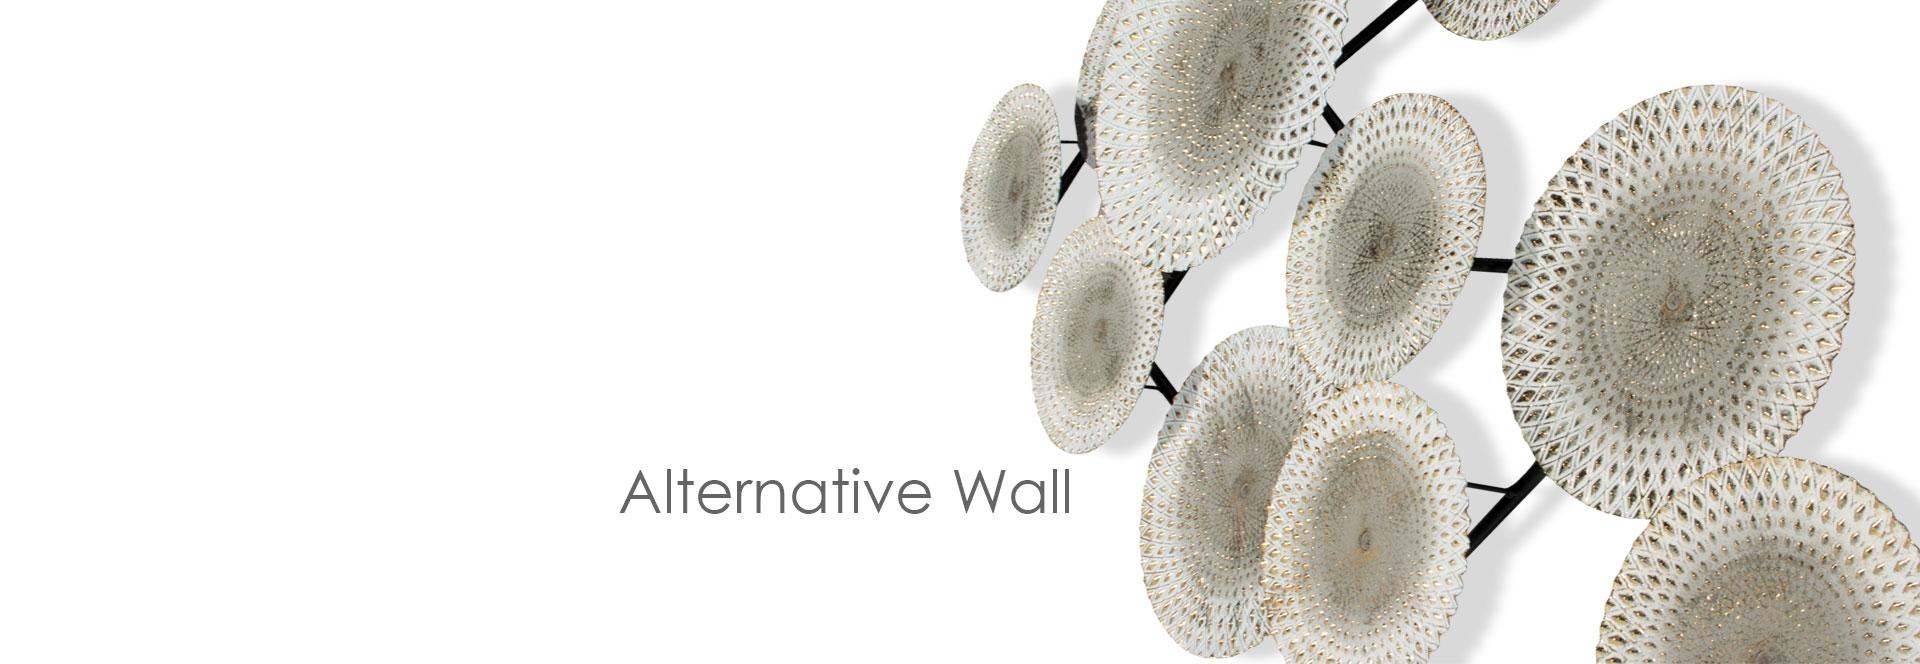 Alternative Wall Decor - All